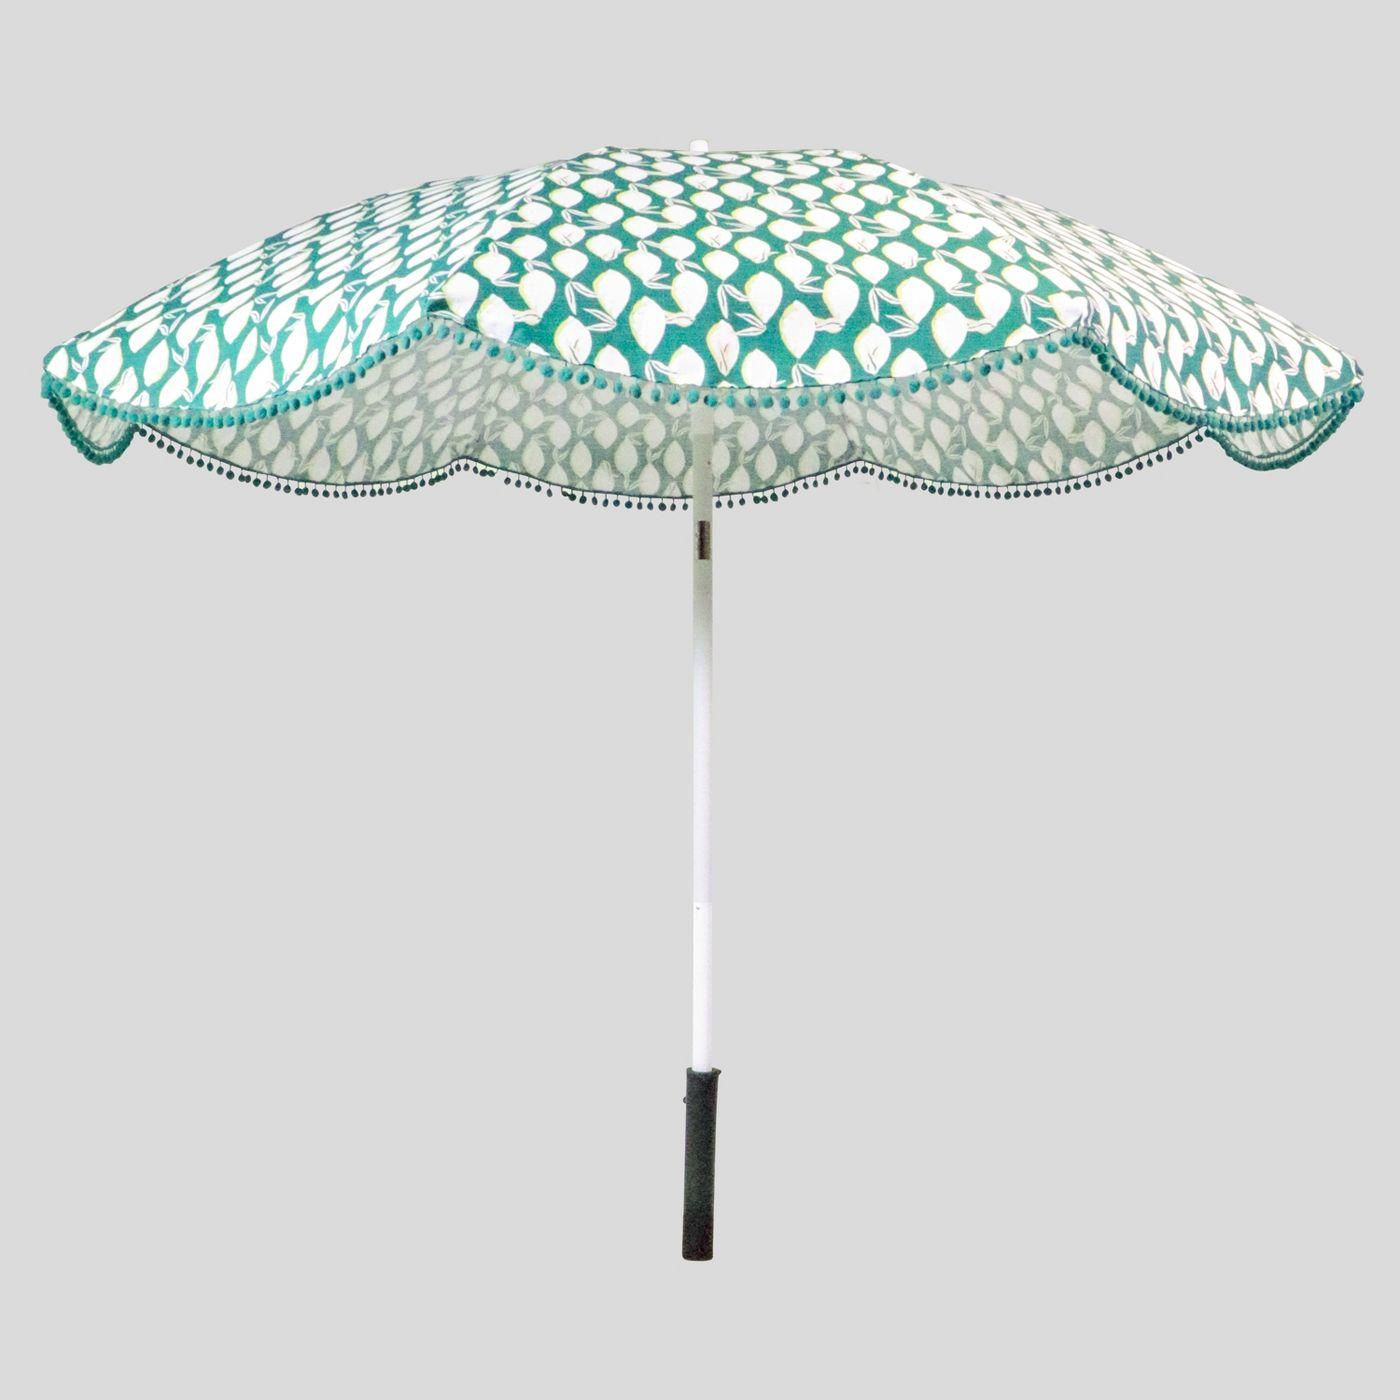 9' Lemons Scalloped Patio Umbrella Jade Green Poms - Light Wood Pole - Opalhouse™ - image 1 of 2